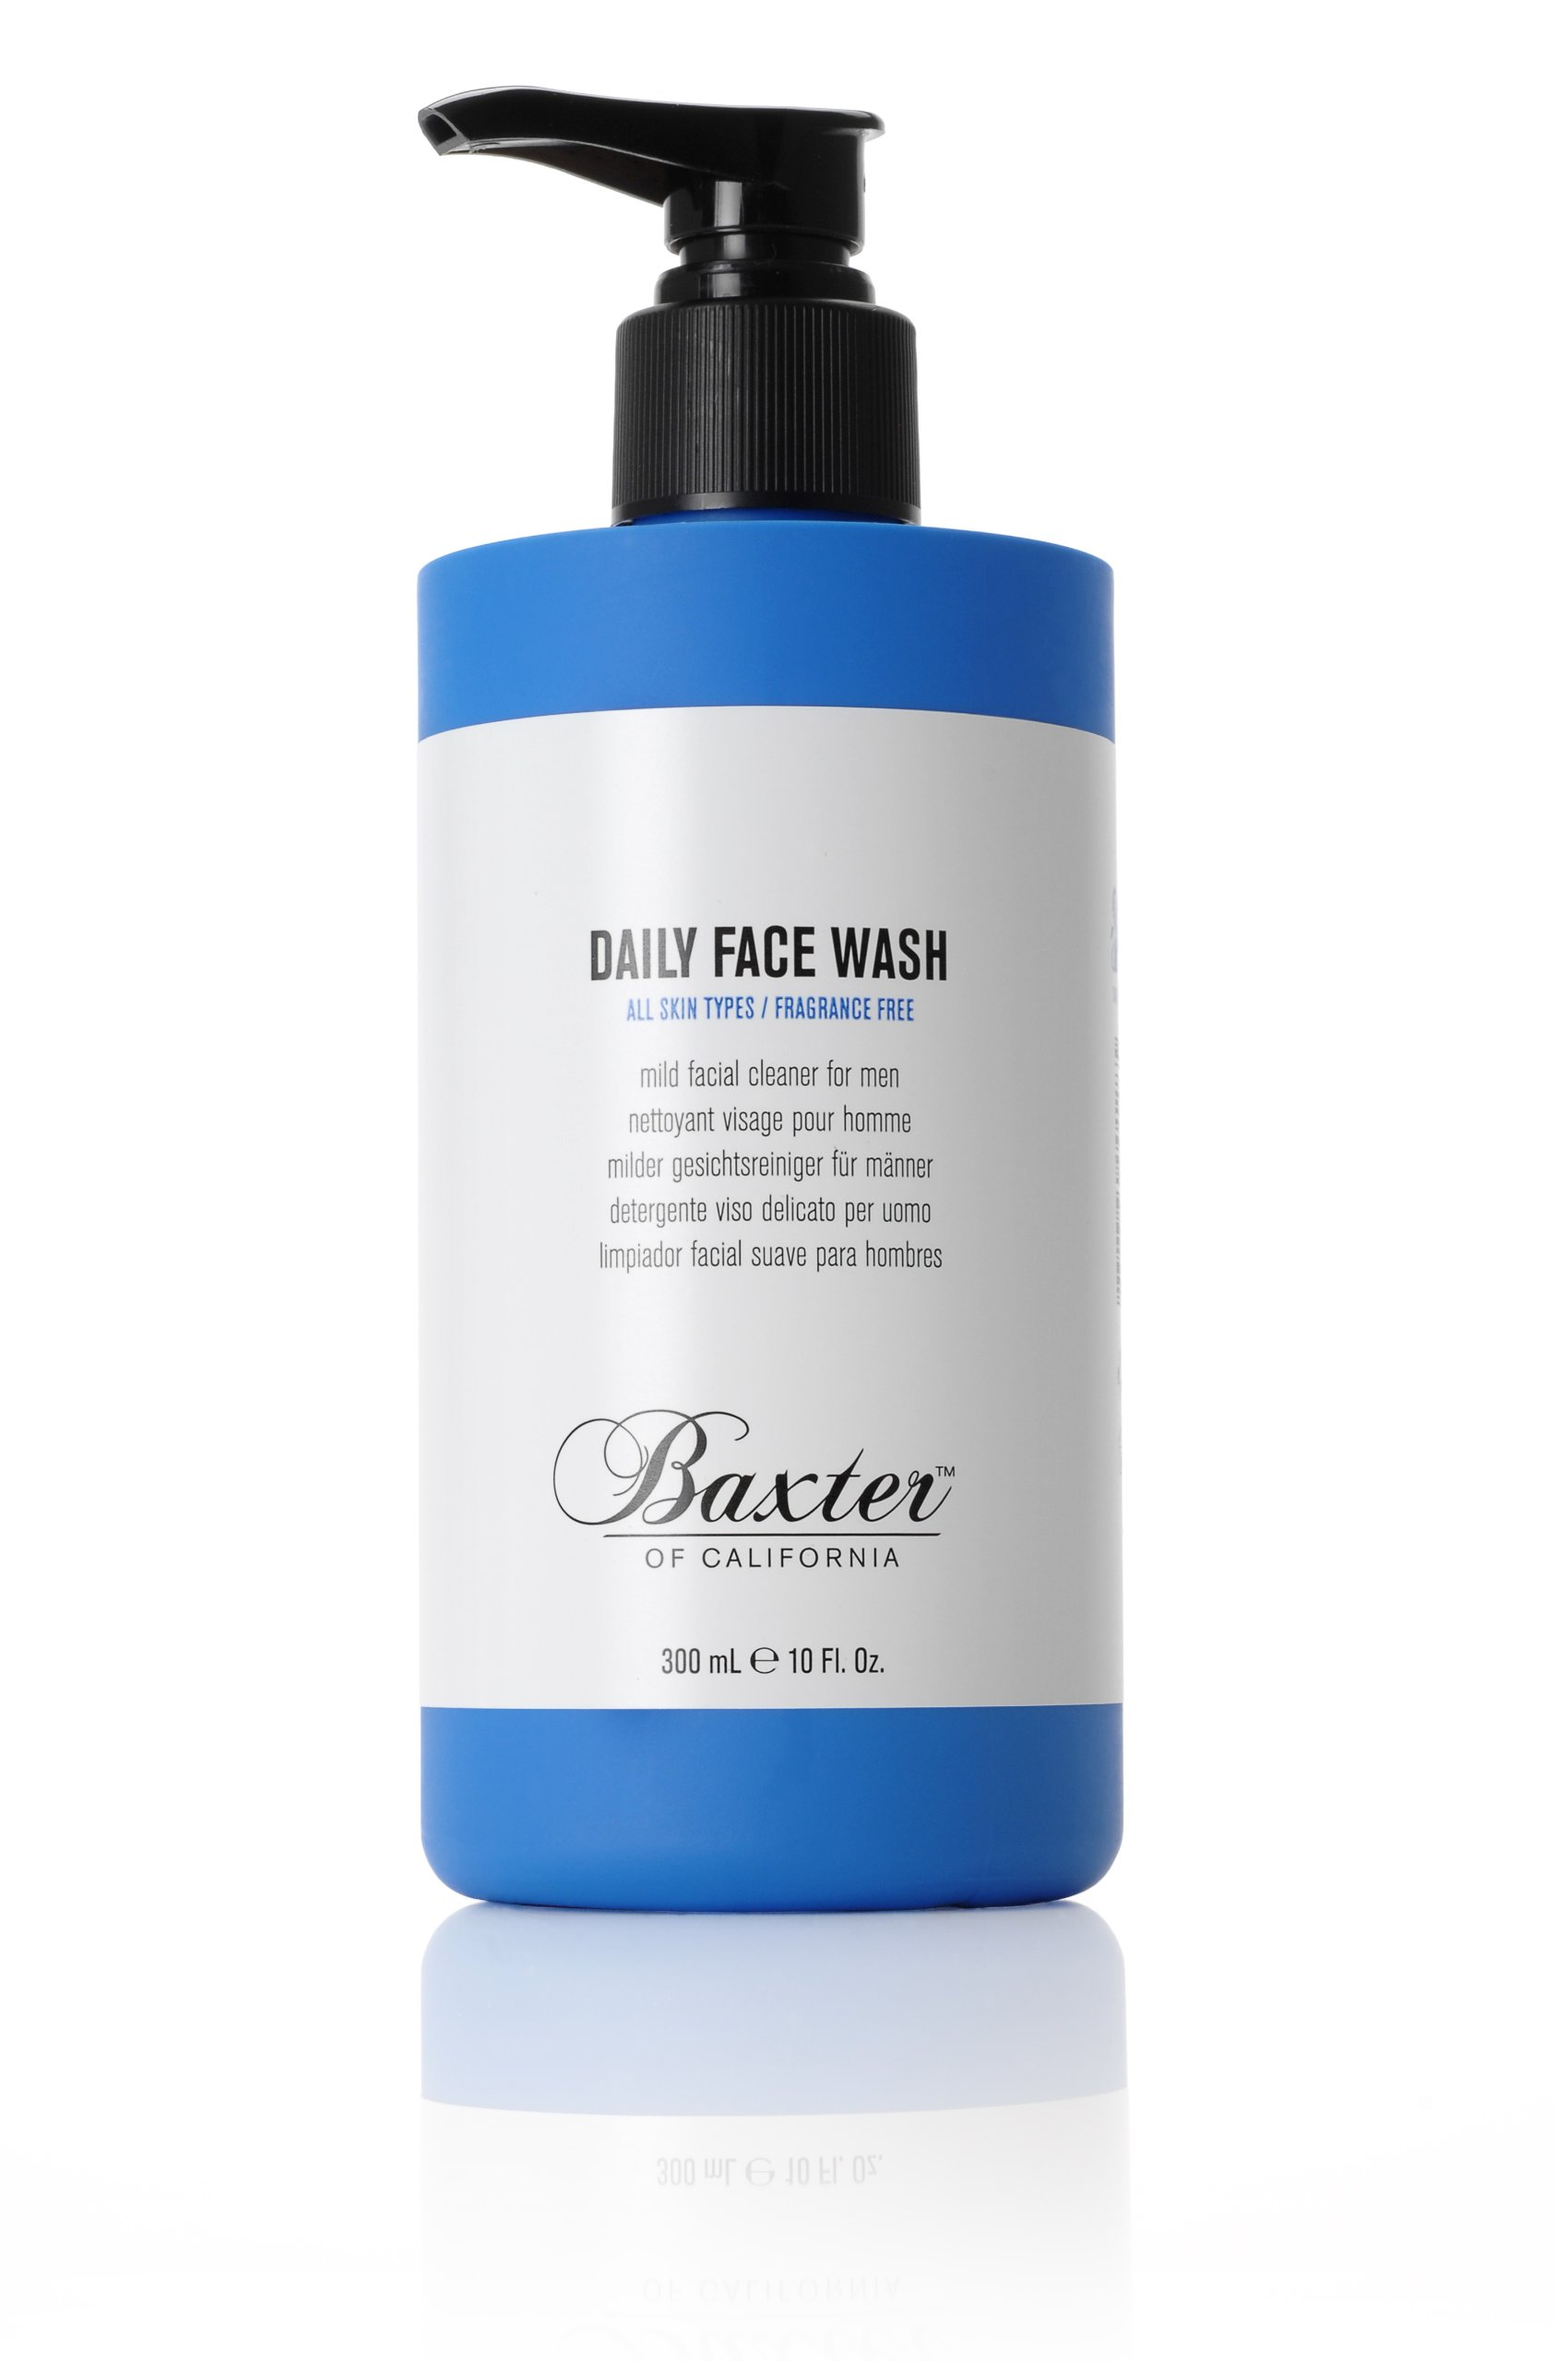 Baxter of California Daily Face Wash, 10 fl. oz.